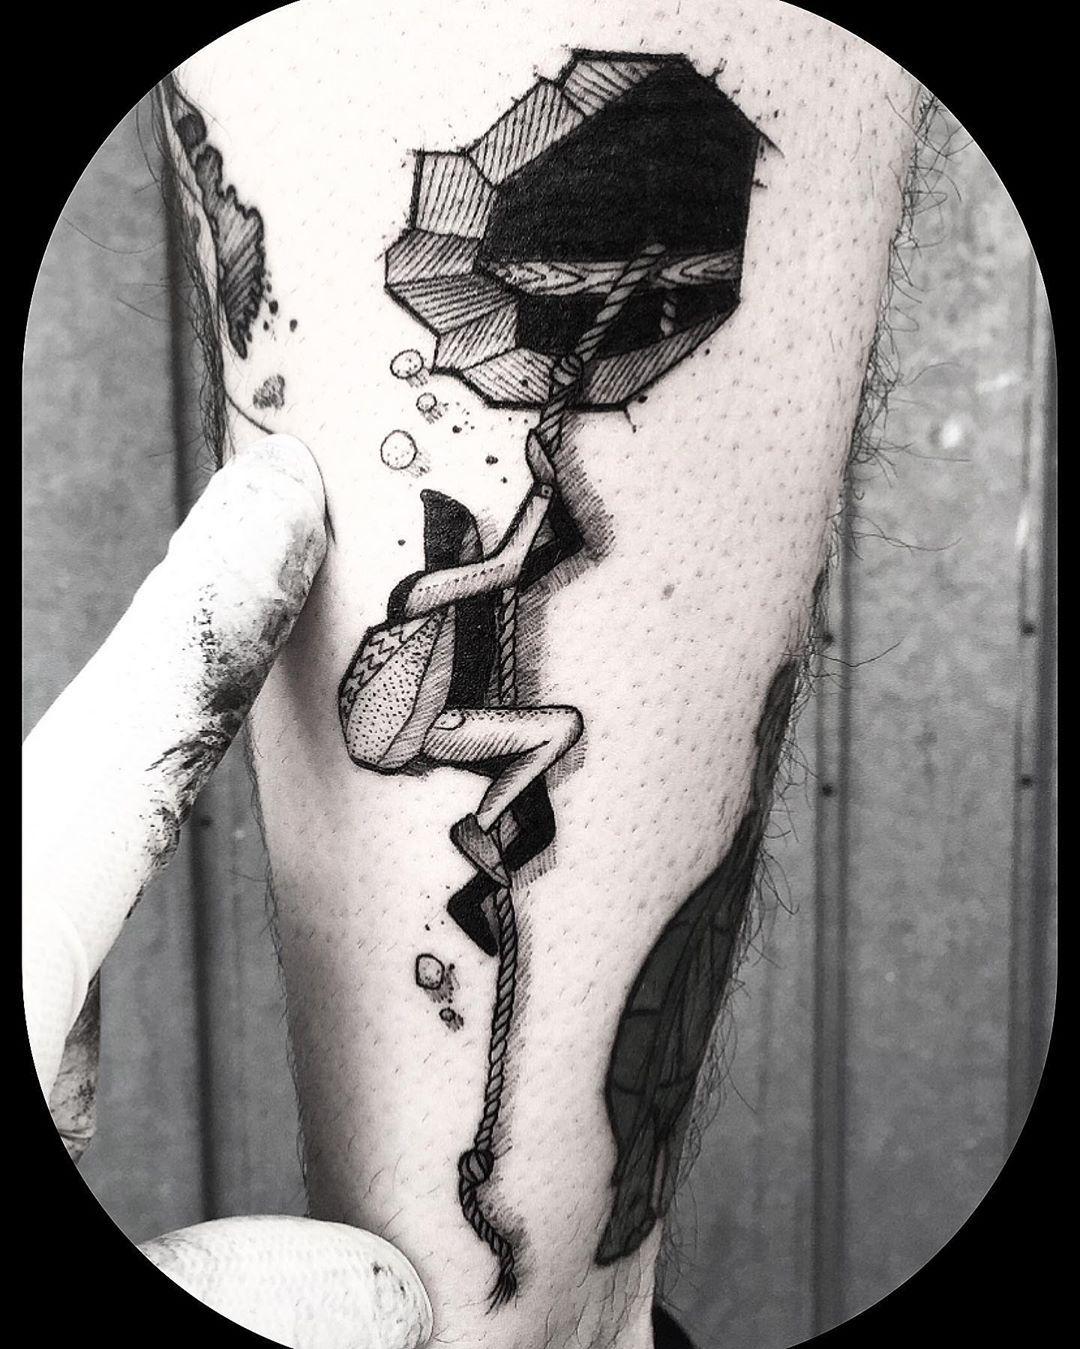 STAY AT HOME and don't panic!  #darkartist #blackworkerssubmission #btattooing #onlyblackart #nopanic #galaxytattoo #modernart#tattooart #bombayfoor #blxckink #blacktattoomag #blacktattooart #dotwork #tattooartist #stayathome #finelinetattoo #tattooersubmission #contemporaryart #tattoo_art_worldwide #TAOT #cooltattoos#equilattera #realtattoos #microtattoo #thebesttattooartist #finetattoo #tattrx #illustrationdaily #tattoodo